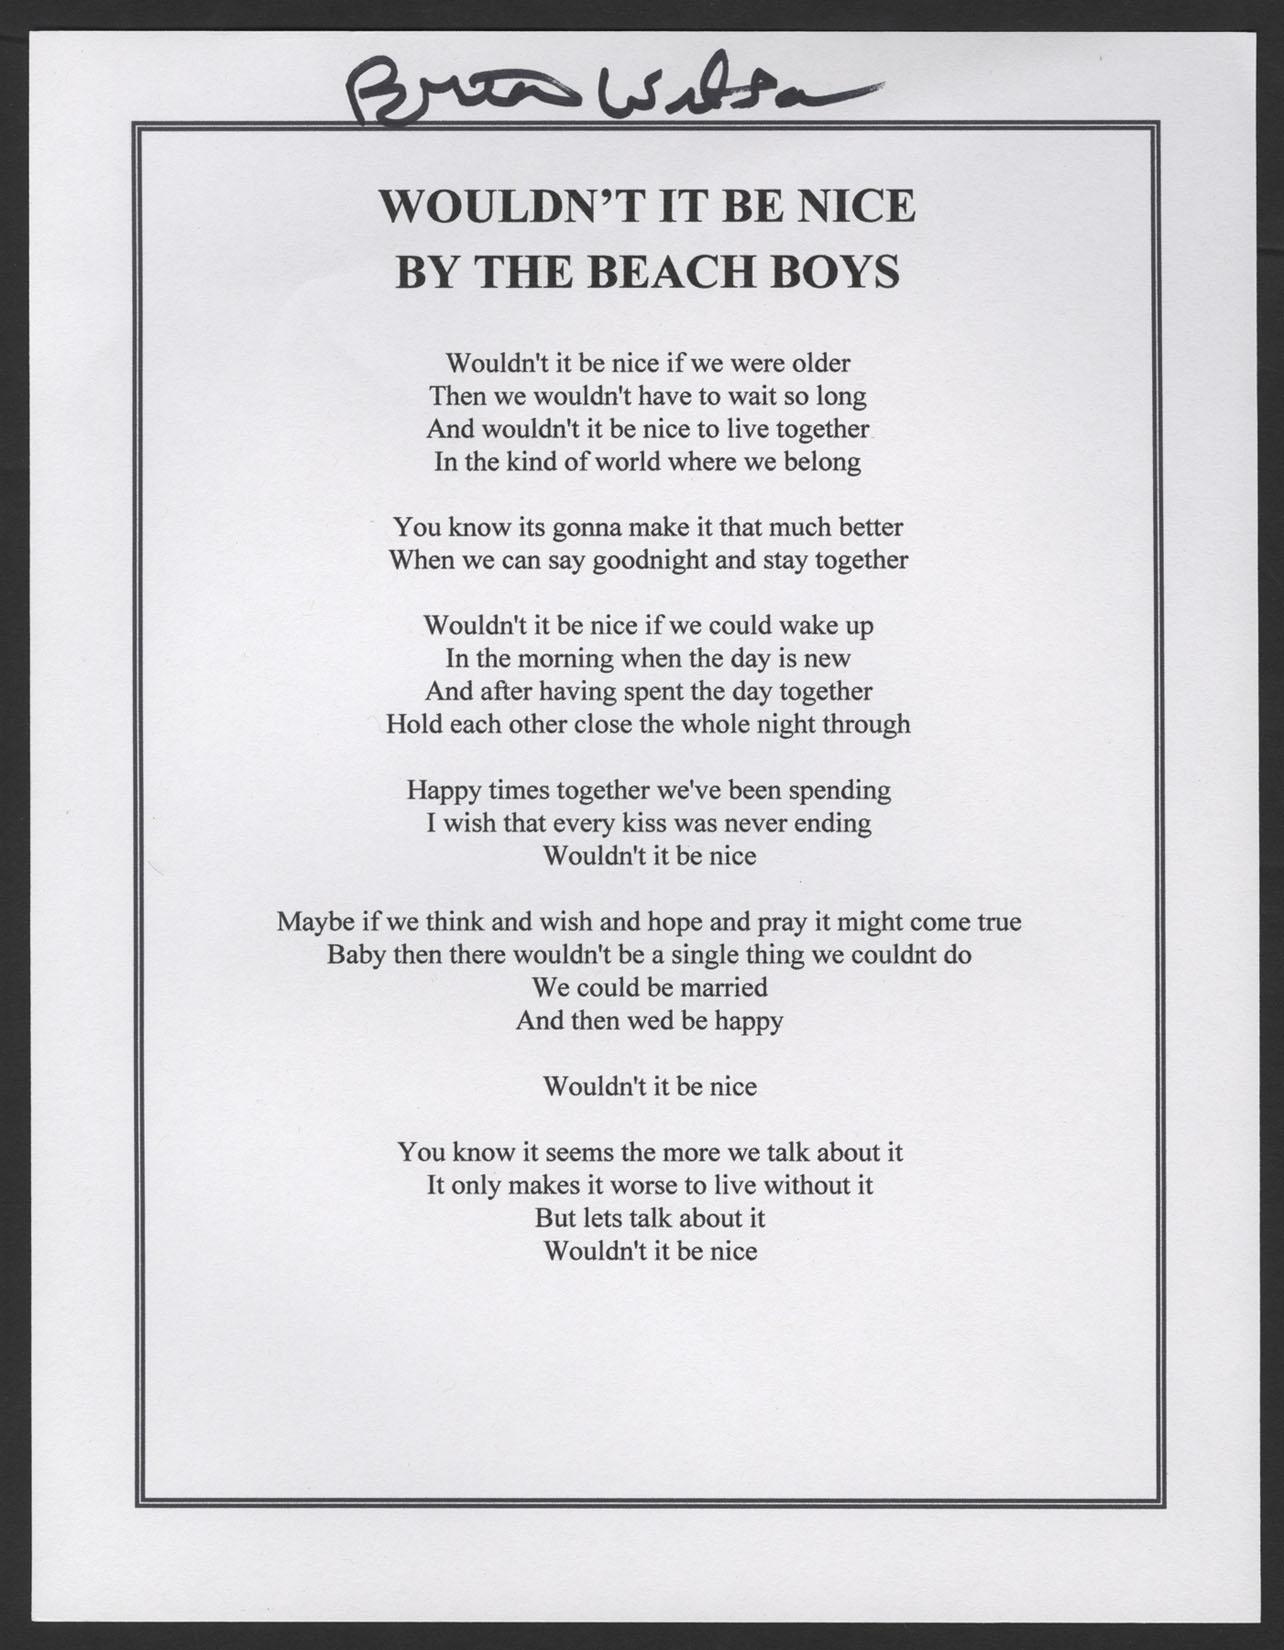 The beach boys wouldnt it be nice lyrics